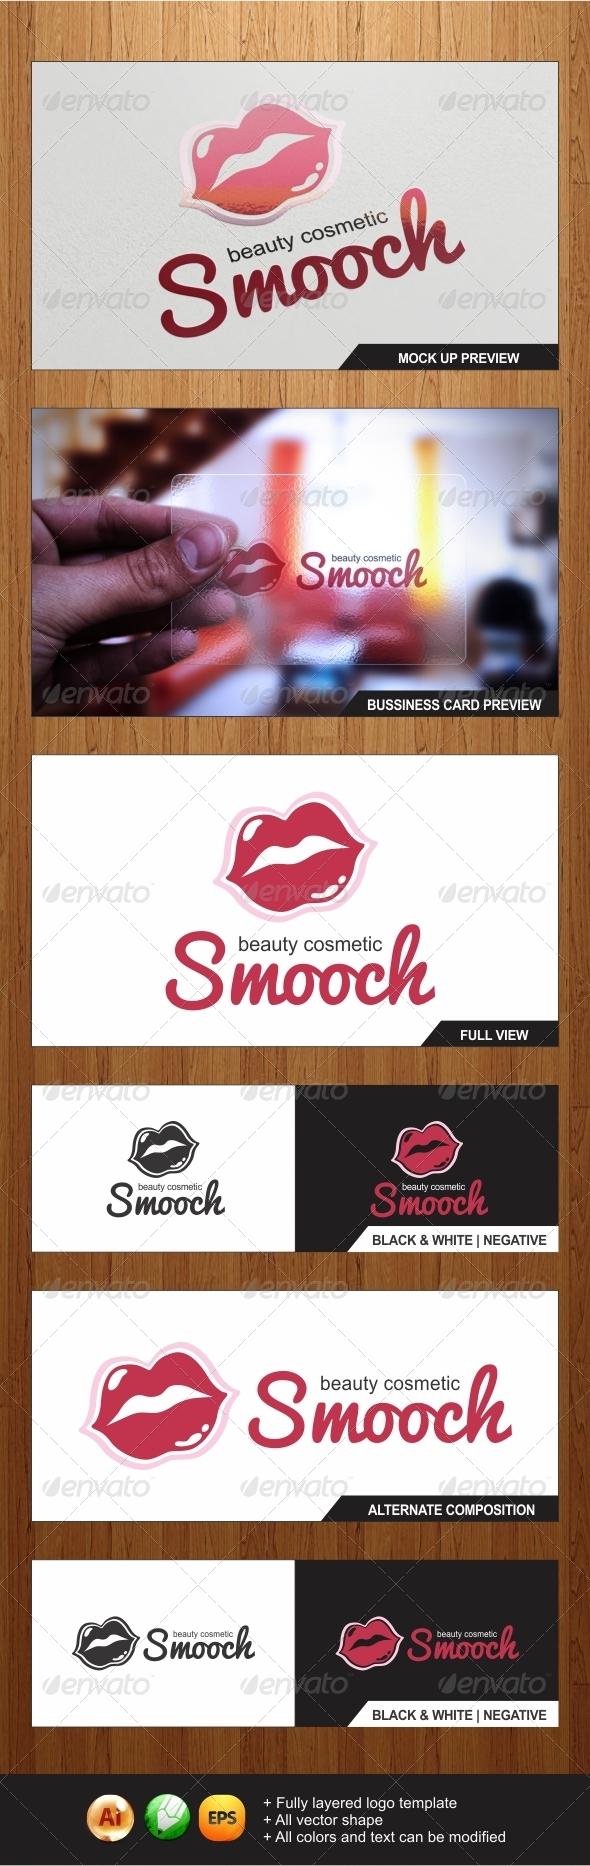 Smooch - Beauty Cosmetic logo template - Objects Logo Templates